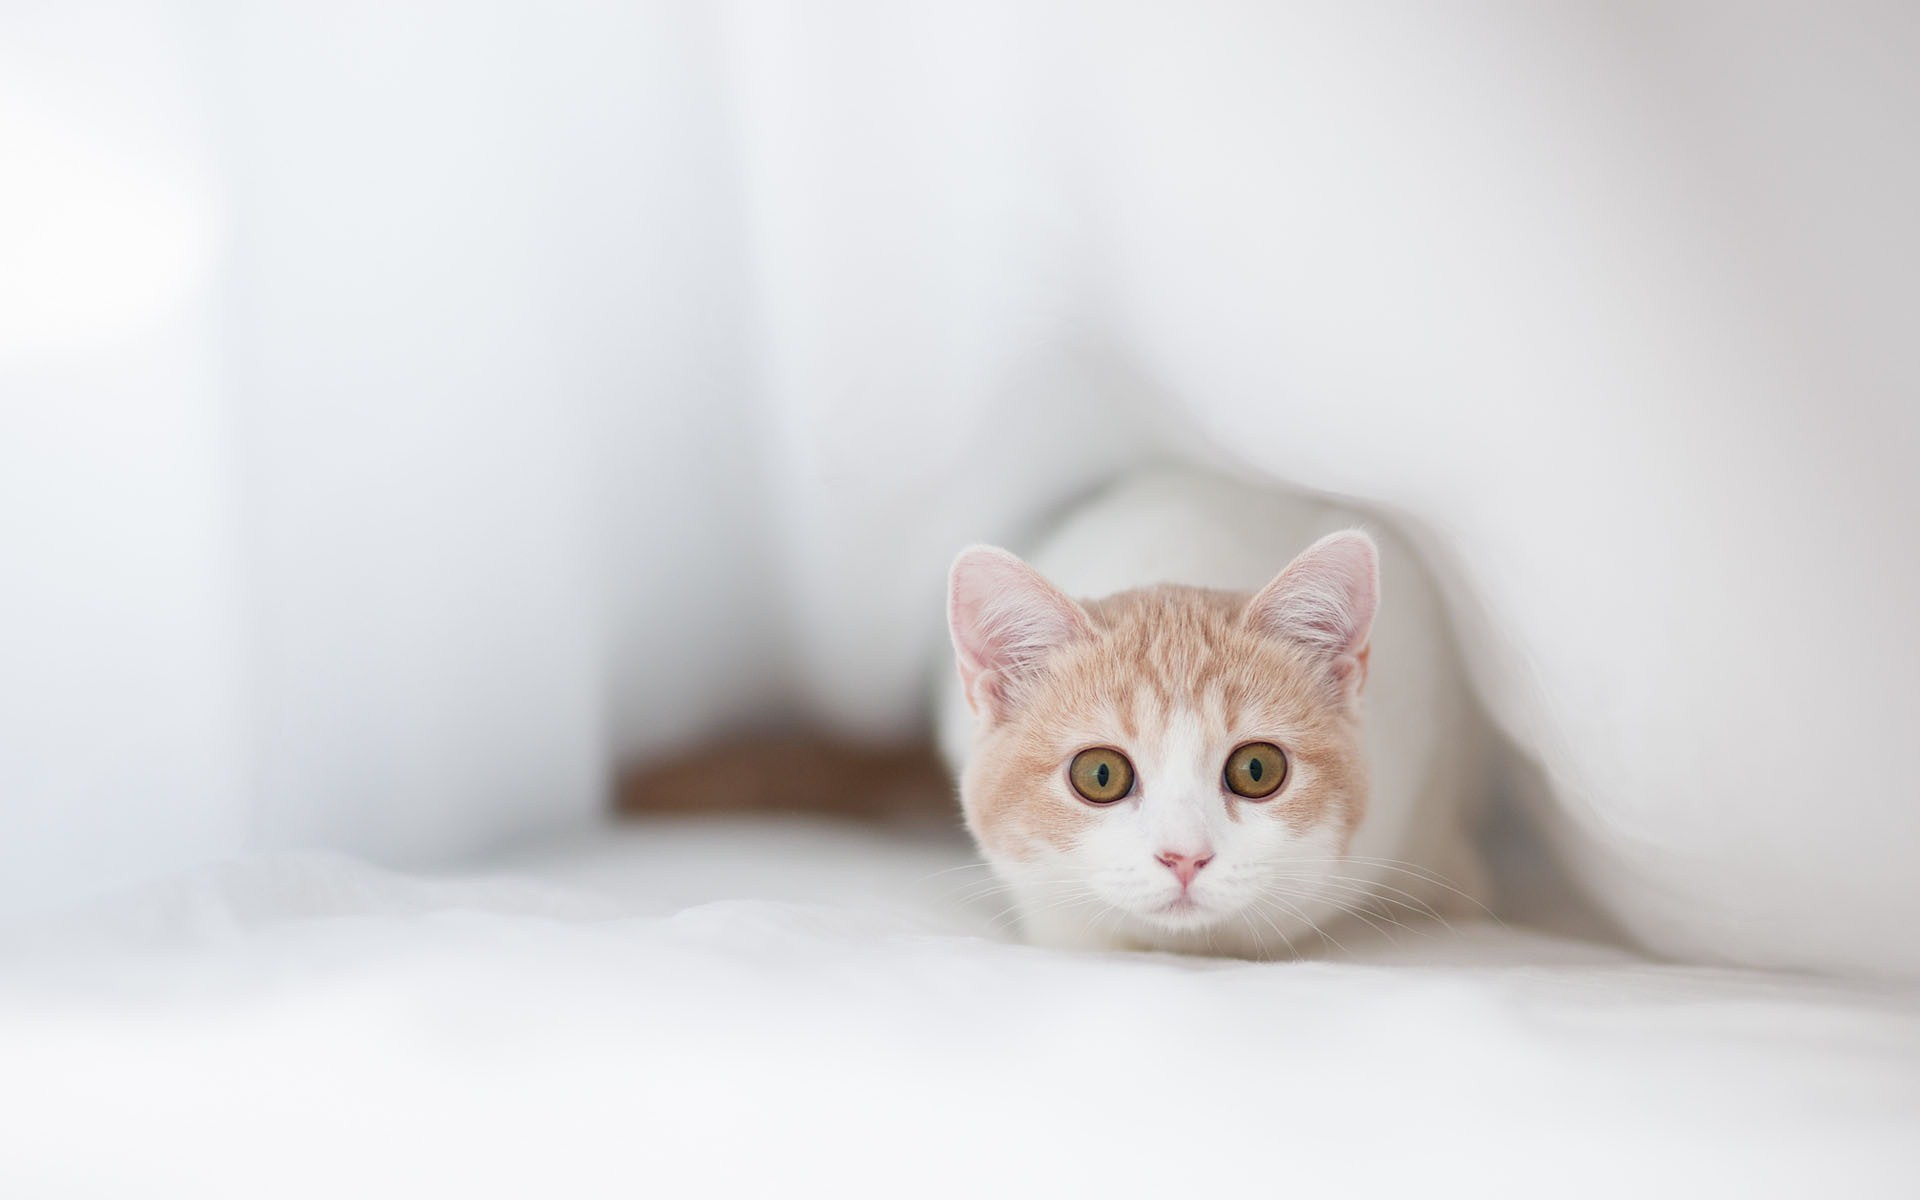 beautiful kittens wallpapers